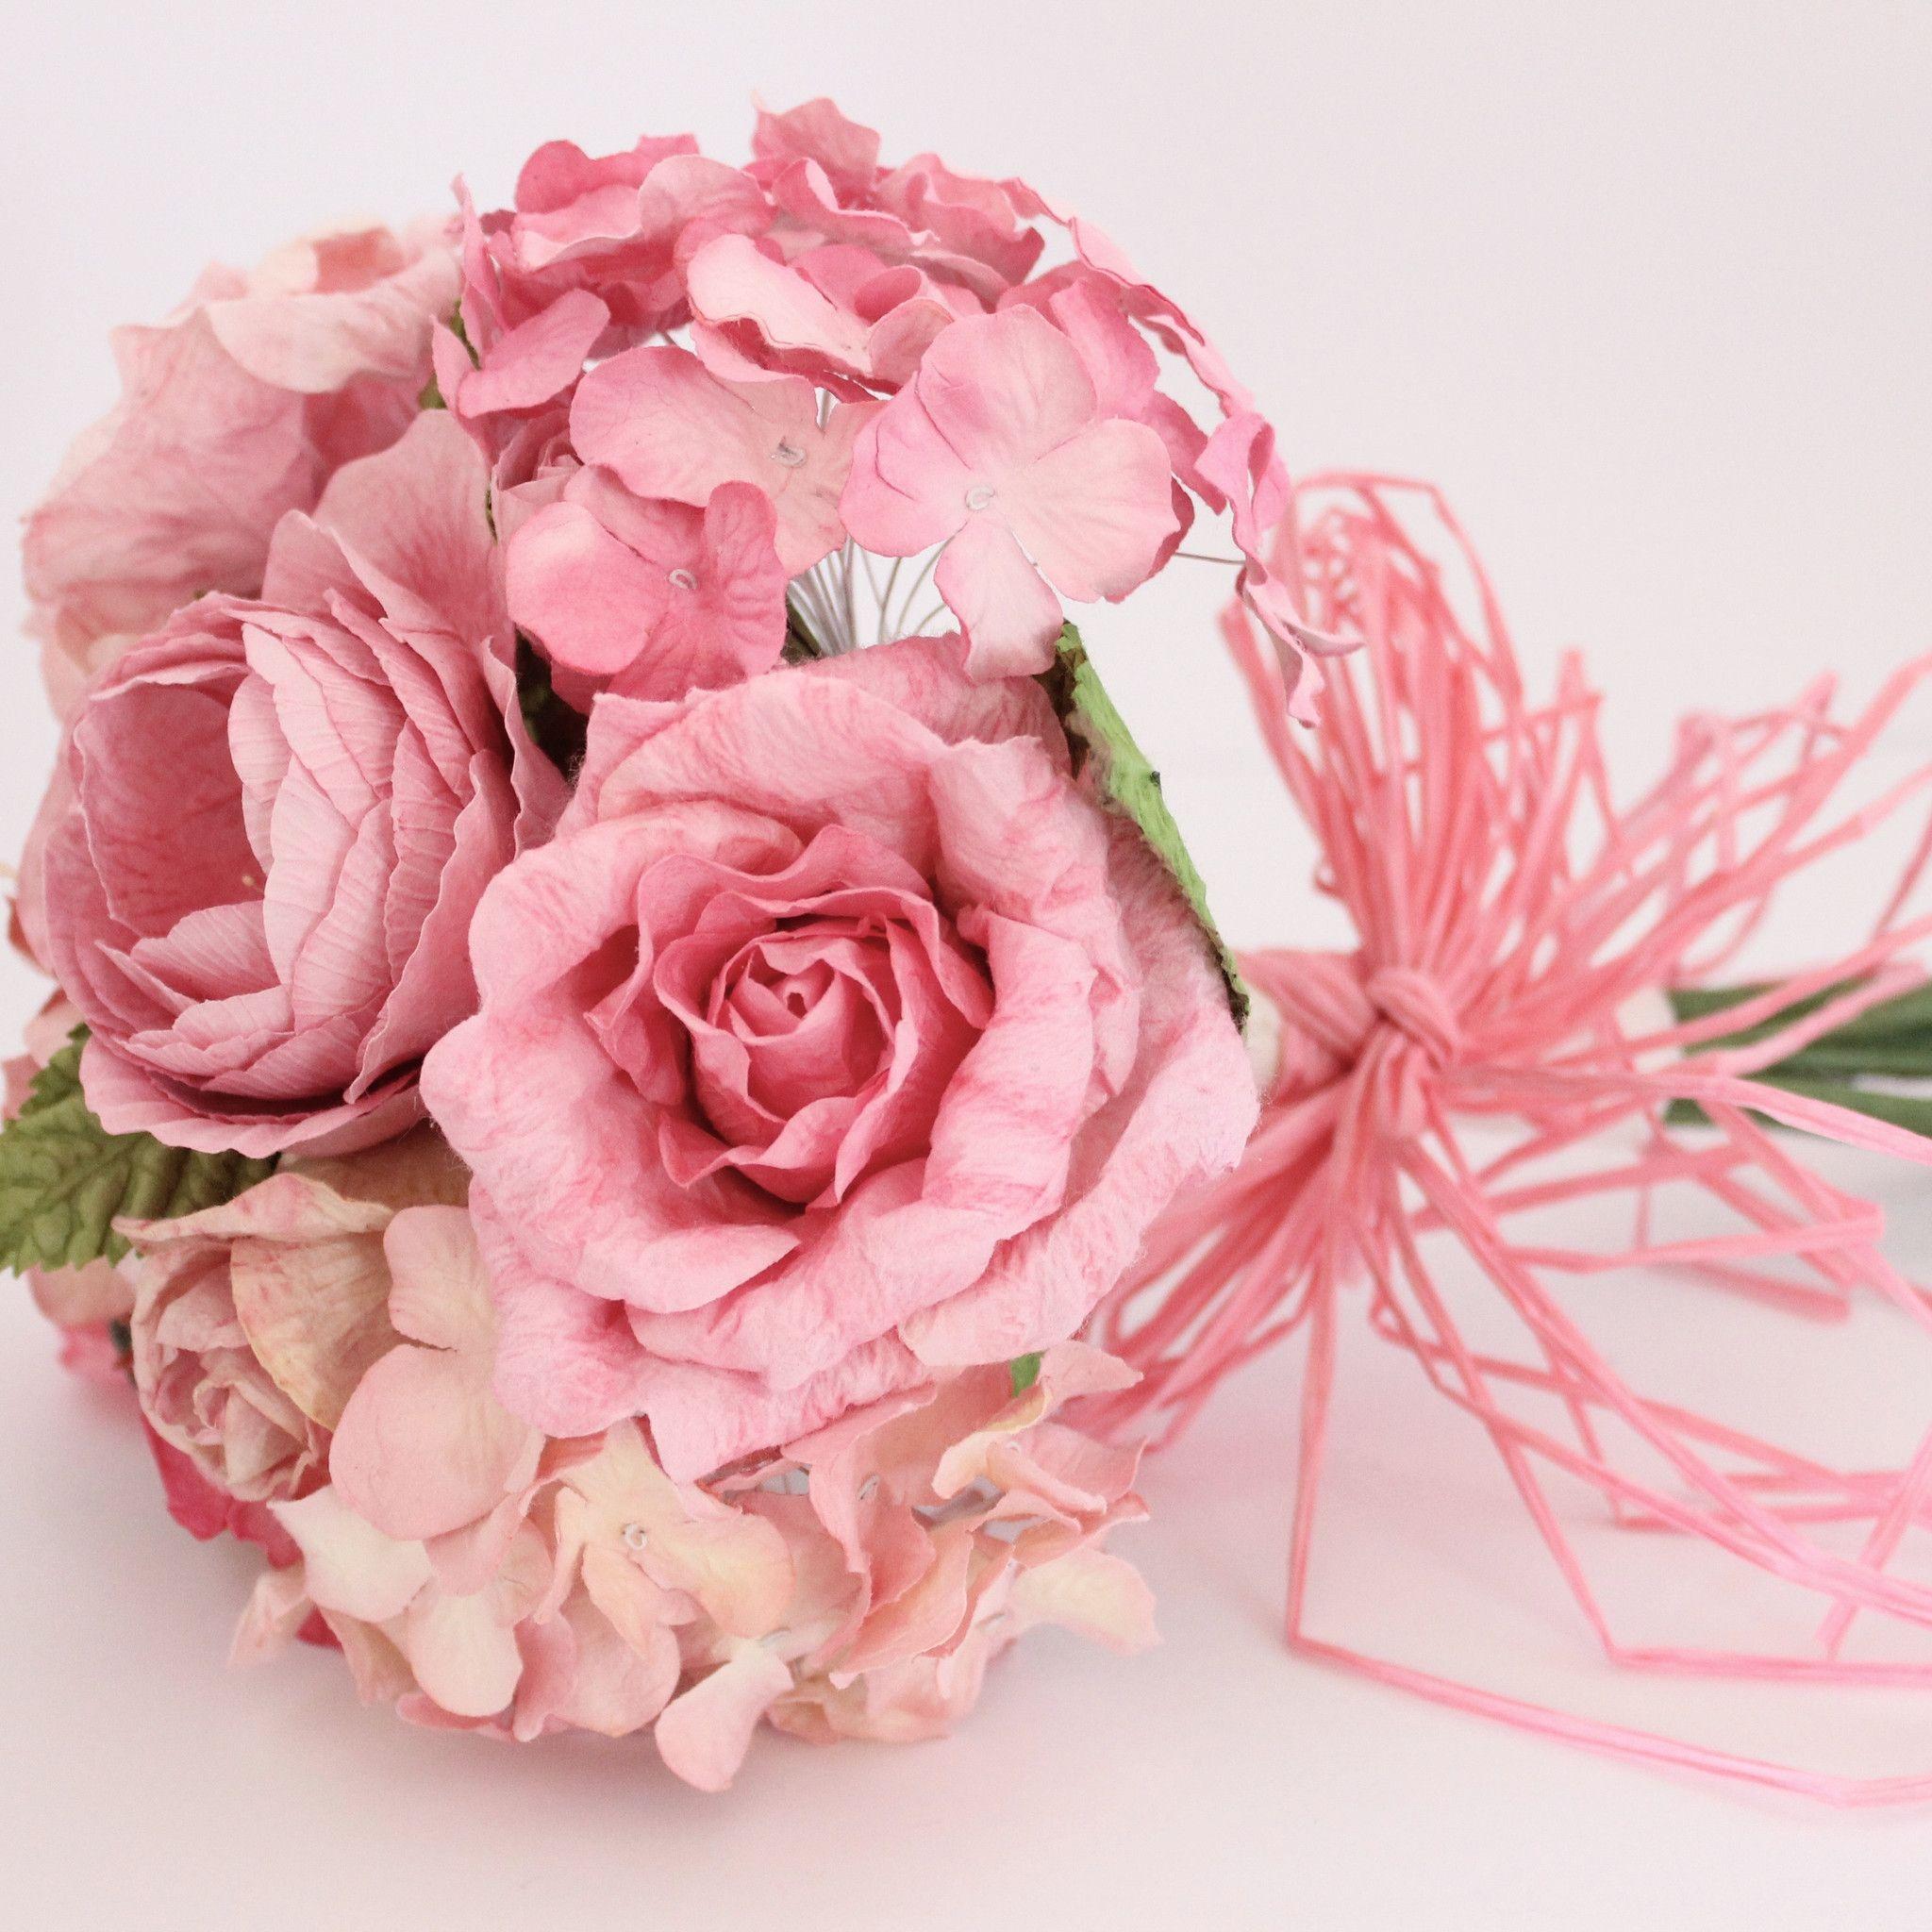 Mixed paper flower bouquet mixed pinks paper flowers australia mixed paper flower bouquet mixed pinks paper flowers australia mightylinksfo